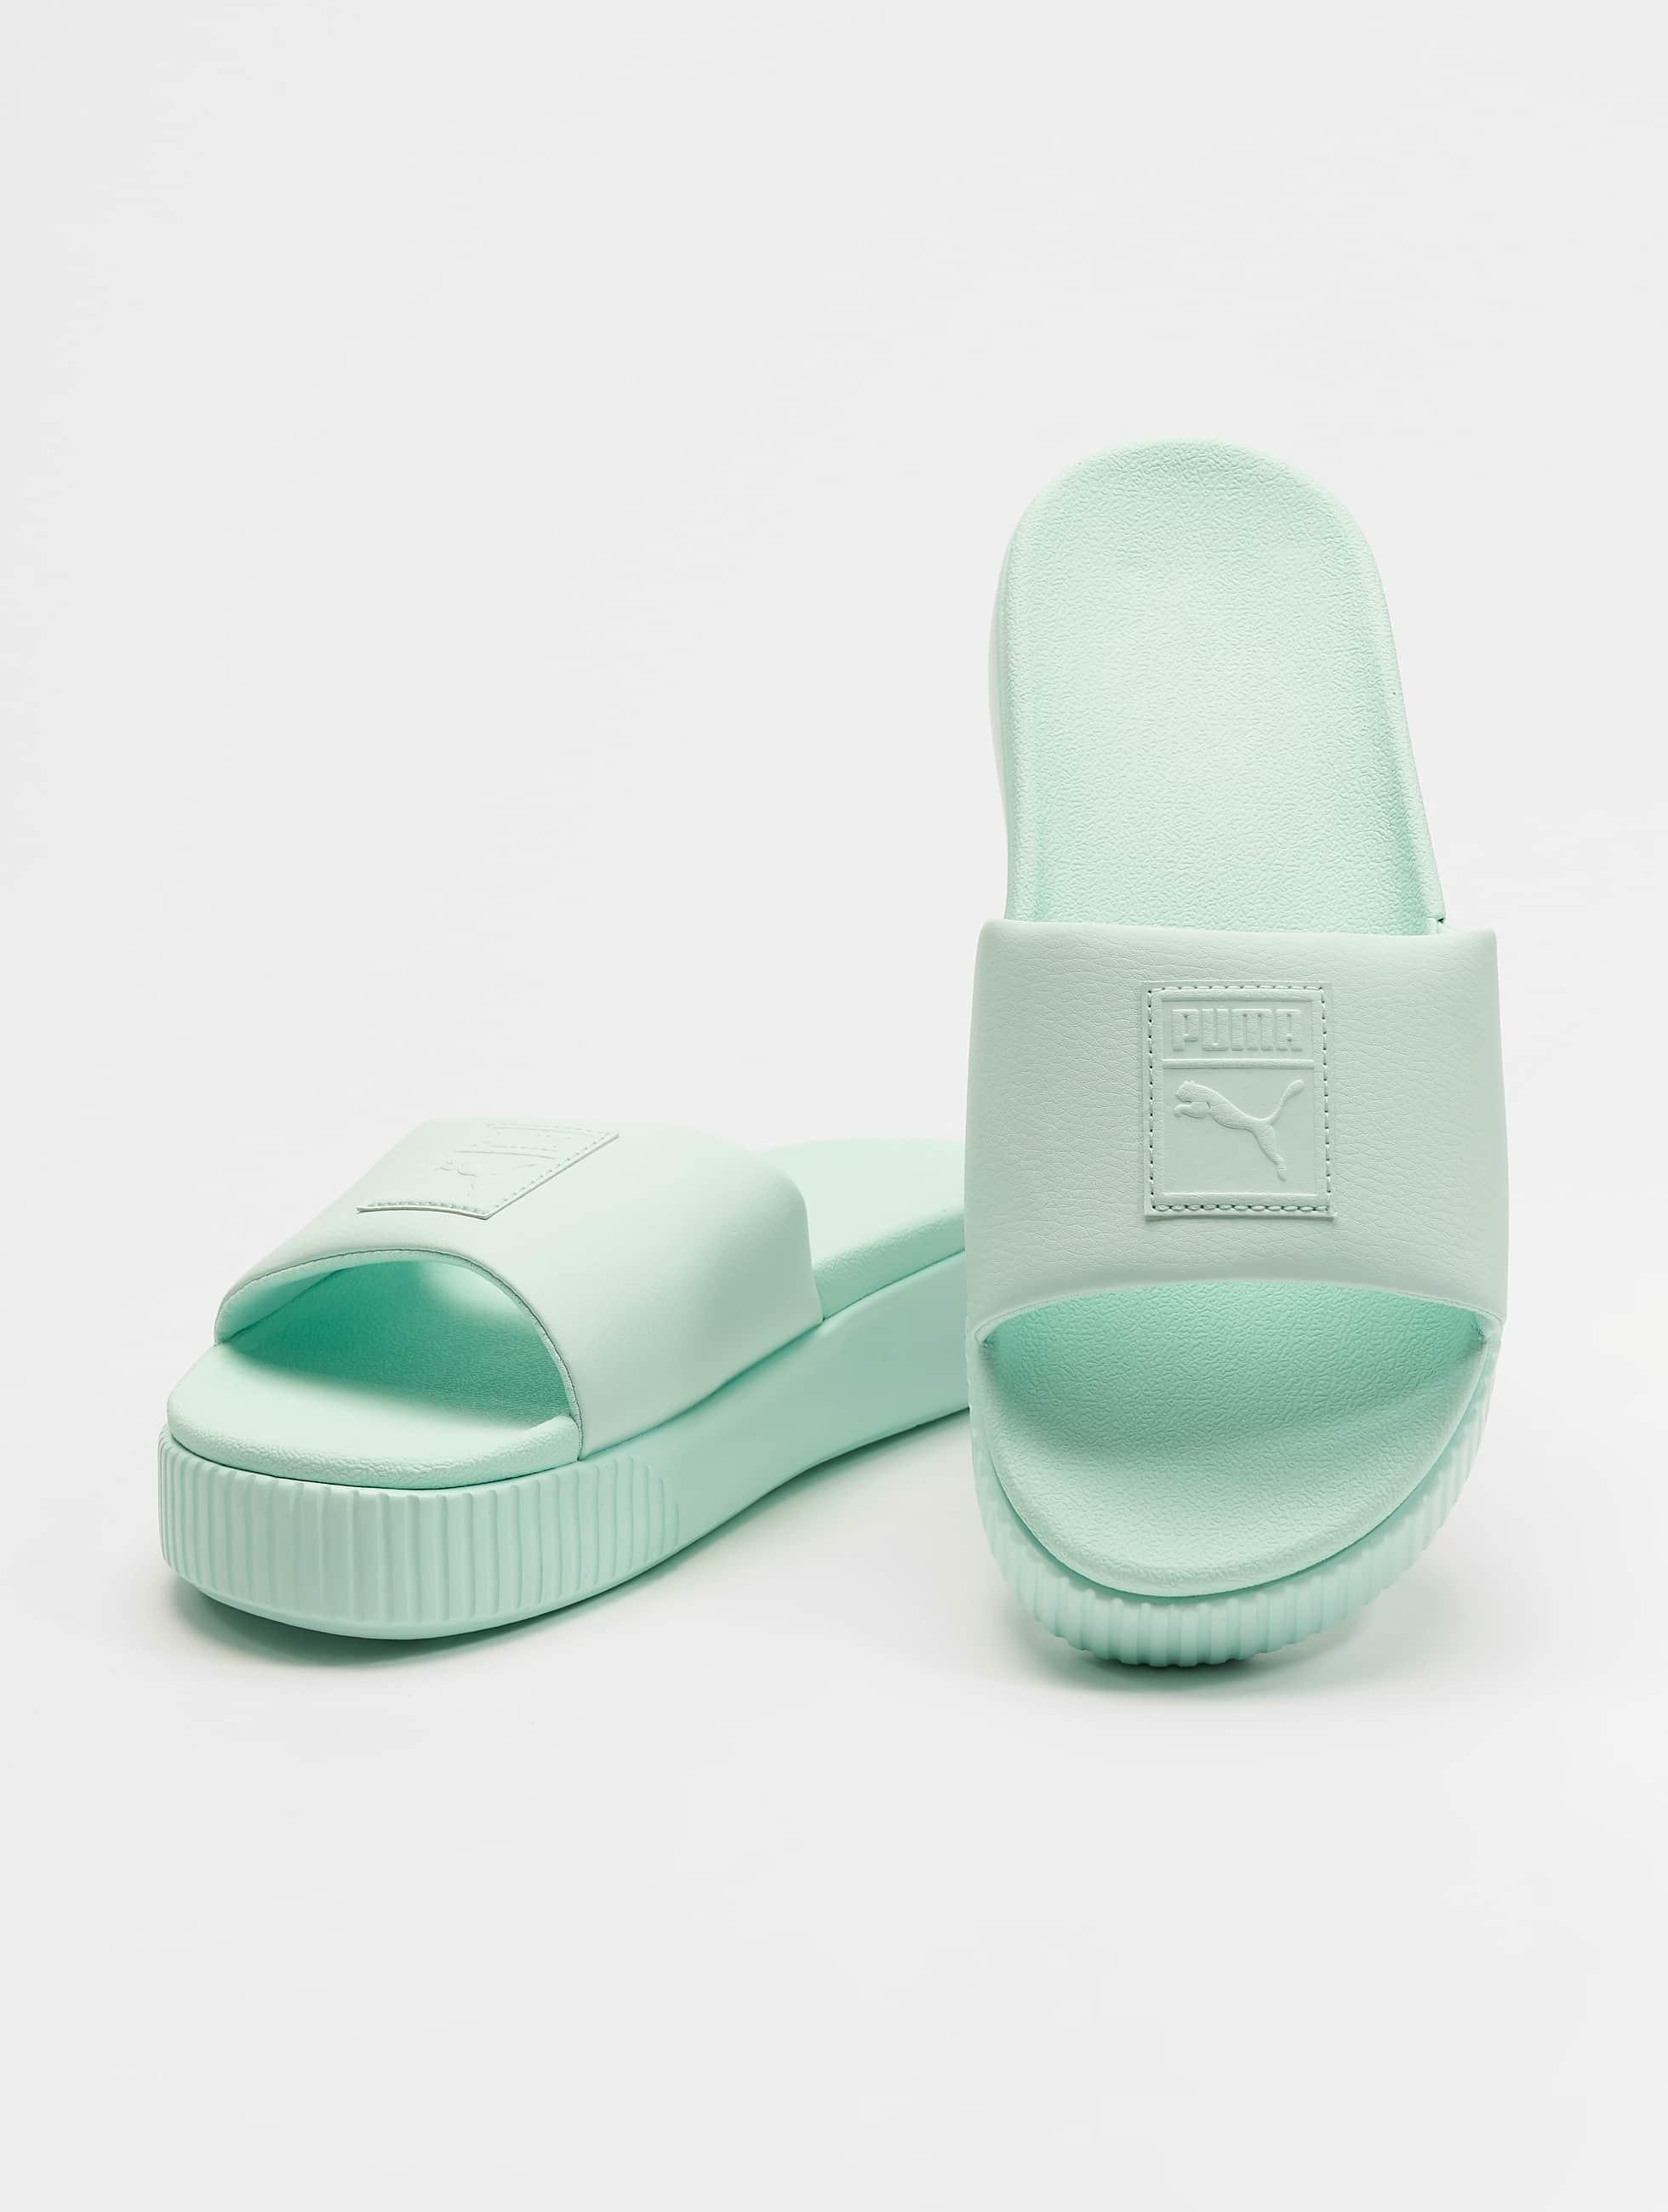 Stoffschuhe Sneaker in Silber 4cm Plateau BITTE LESEN!